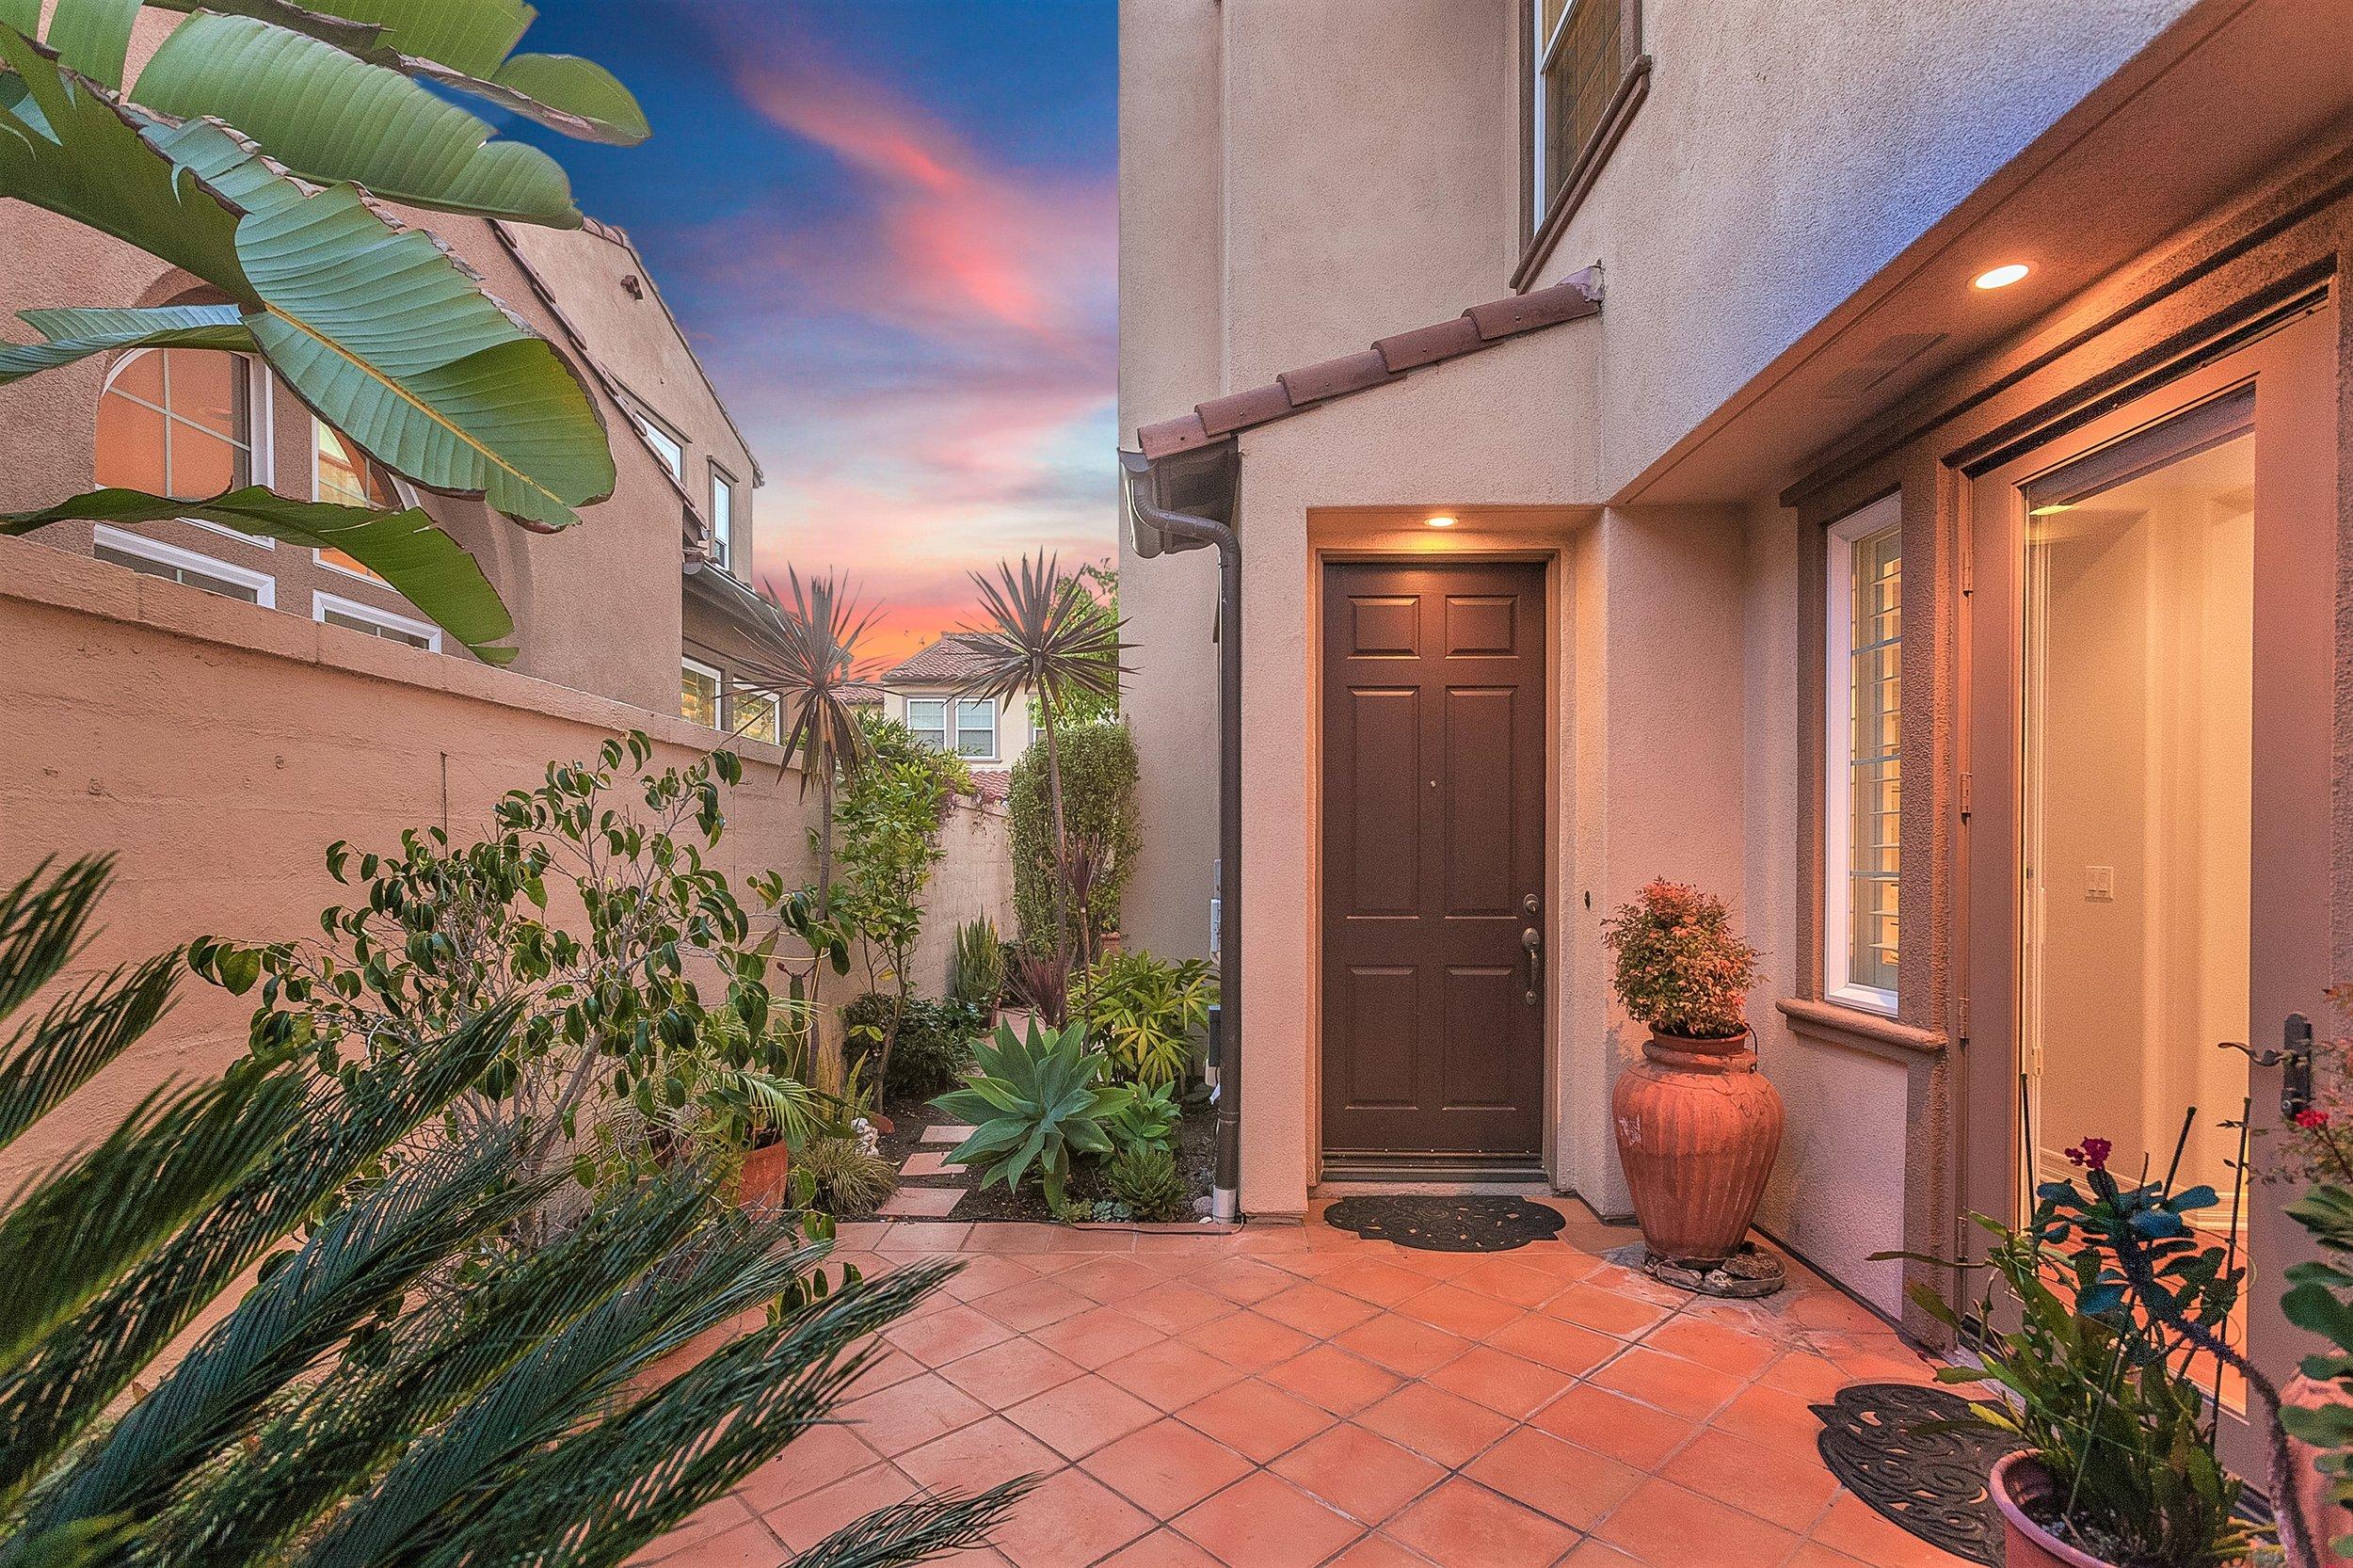 207 Tuebrose -Entry Courtyard @ Sunset.jpg